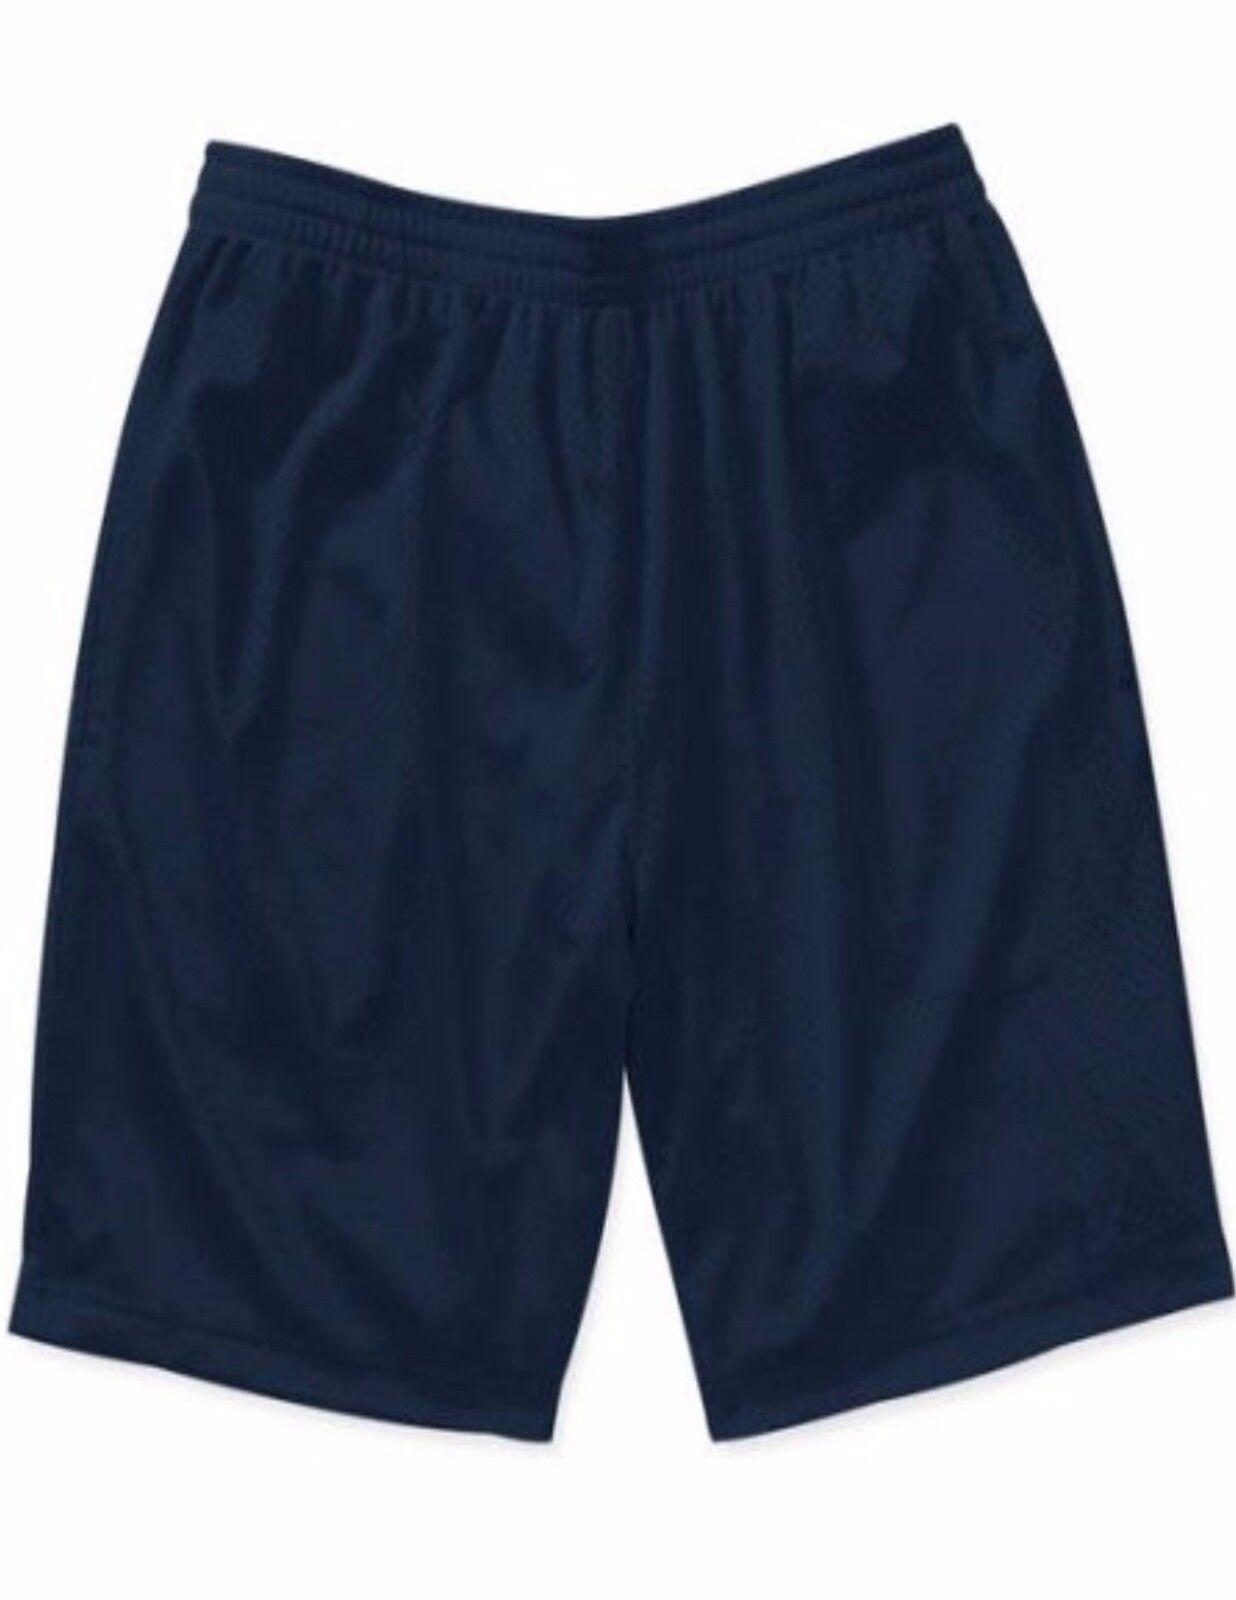 NEW Starter Mens Active Mesh Basketball Running Shorts Navy